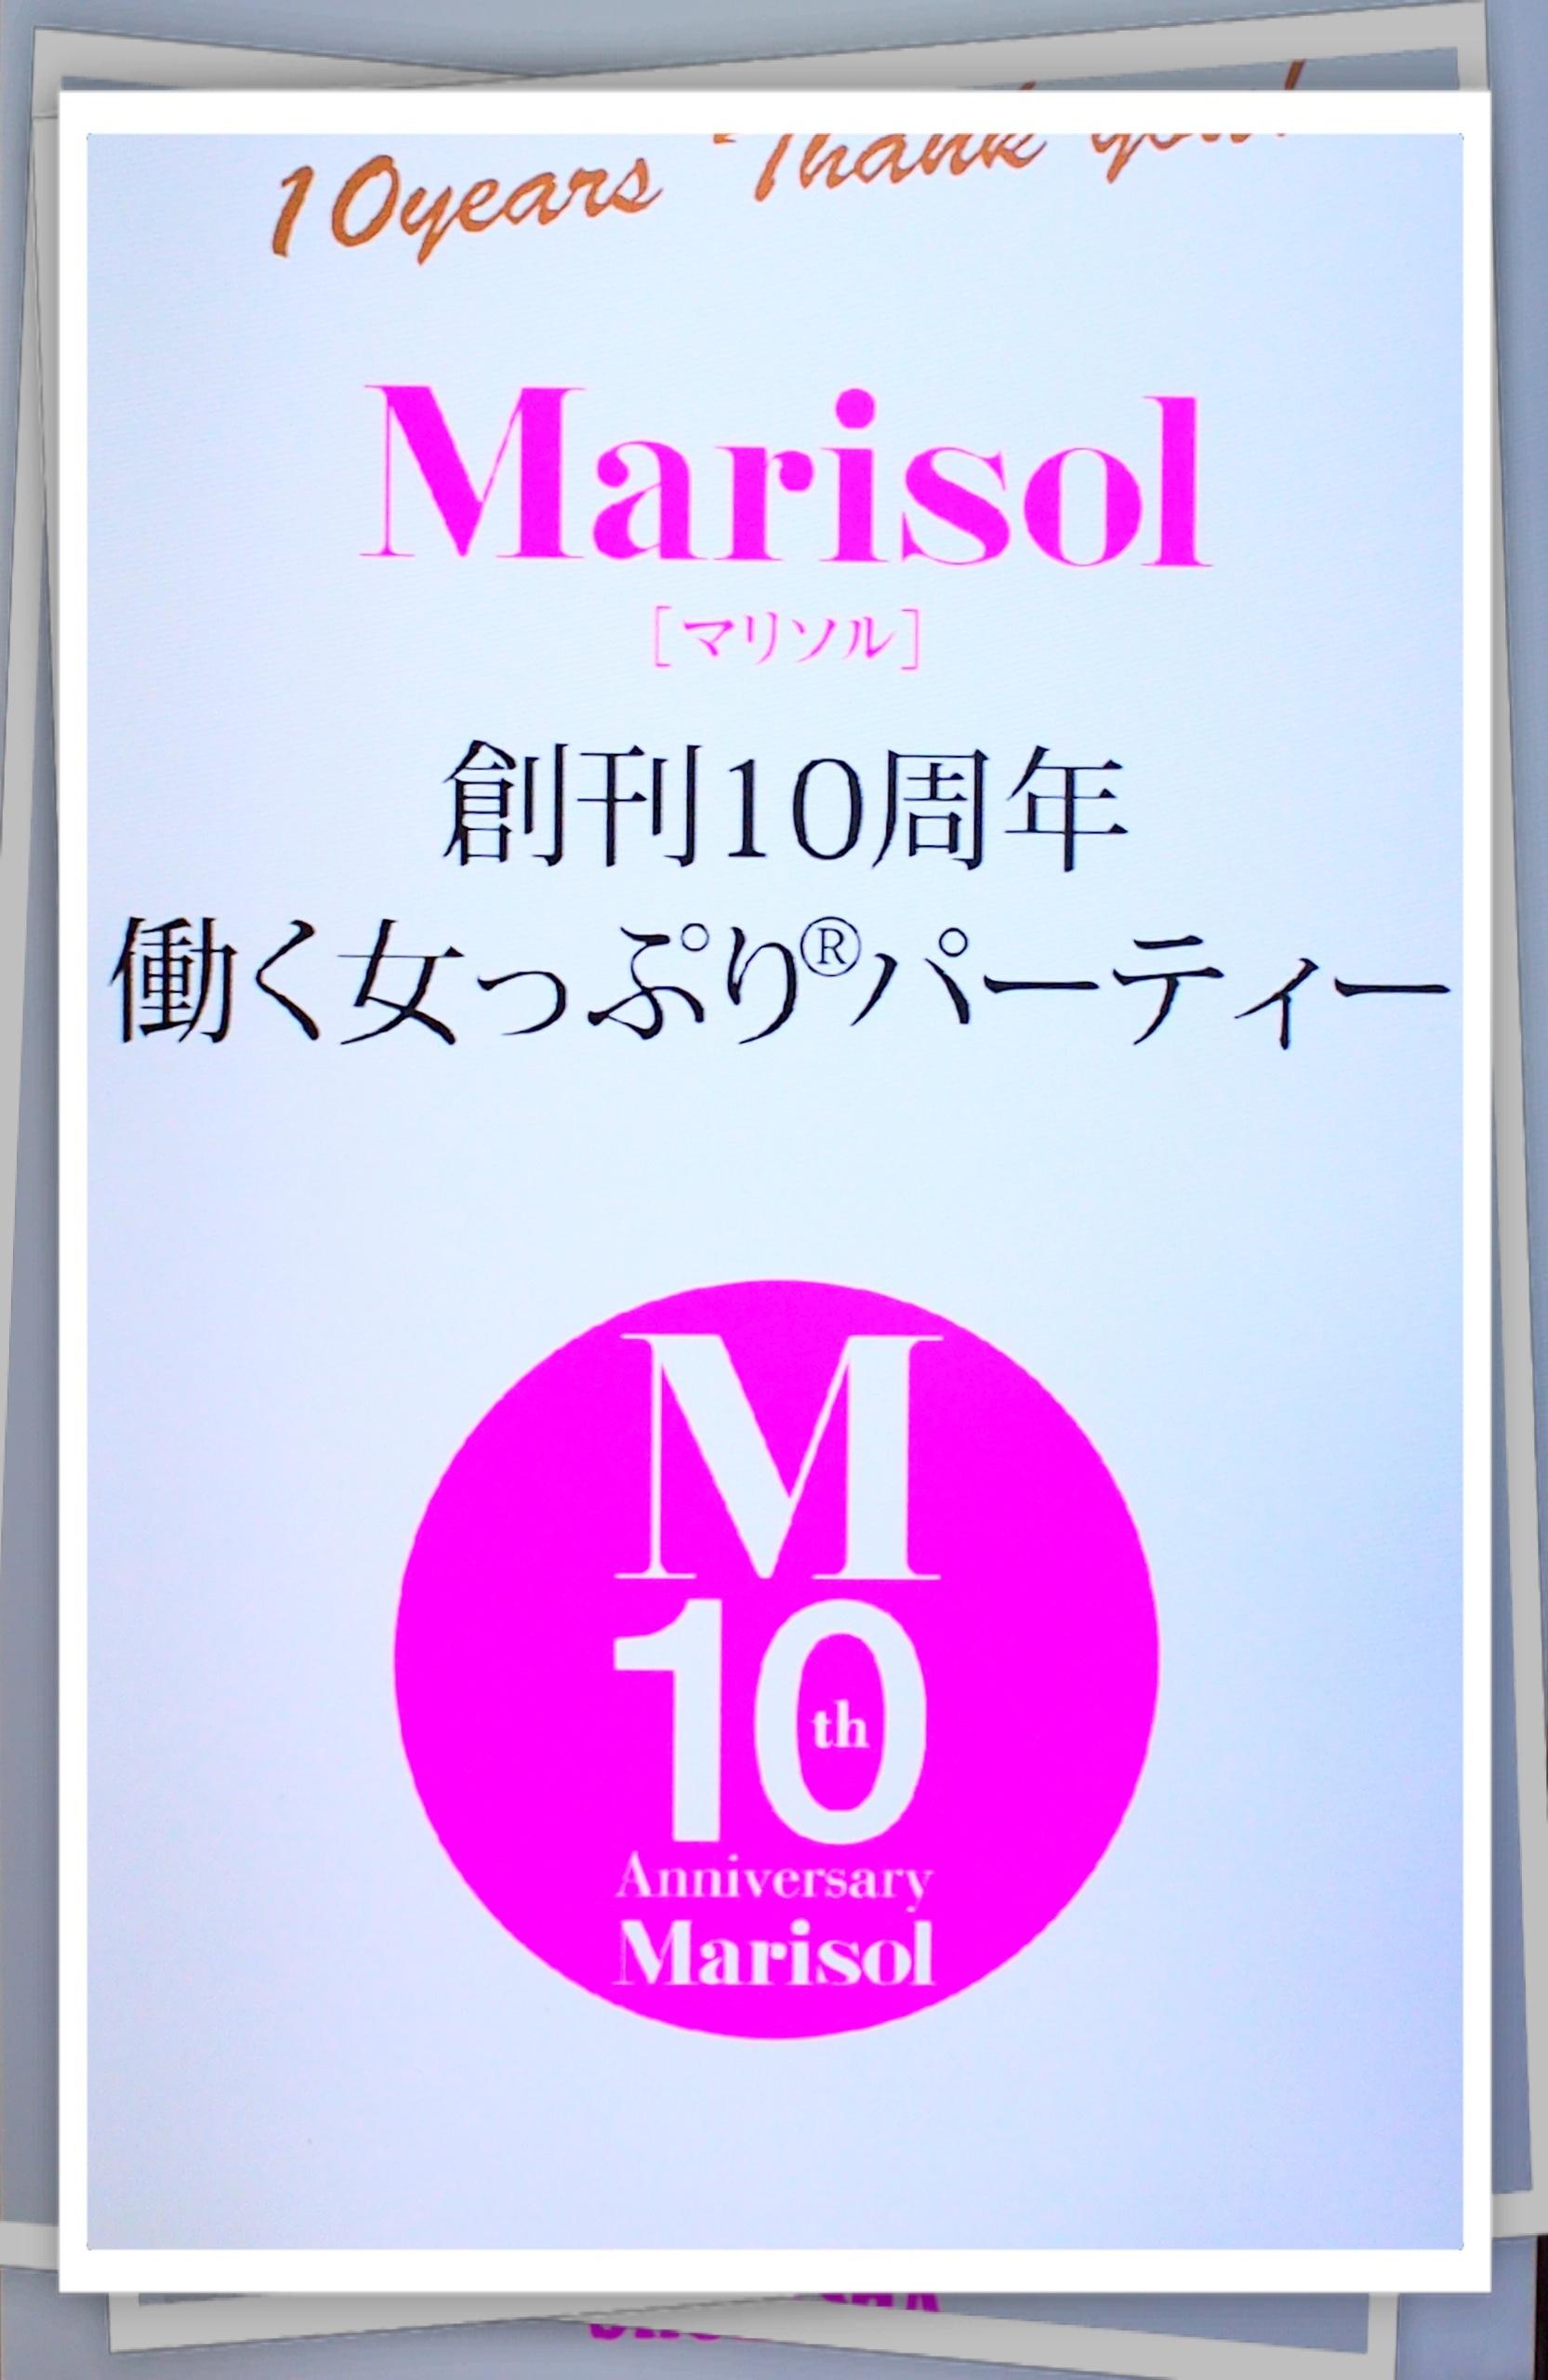 Marisol創刊10年パーティへの道のりで♡_1_2